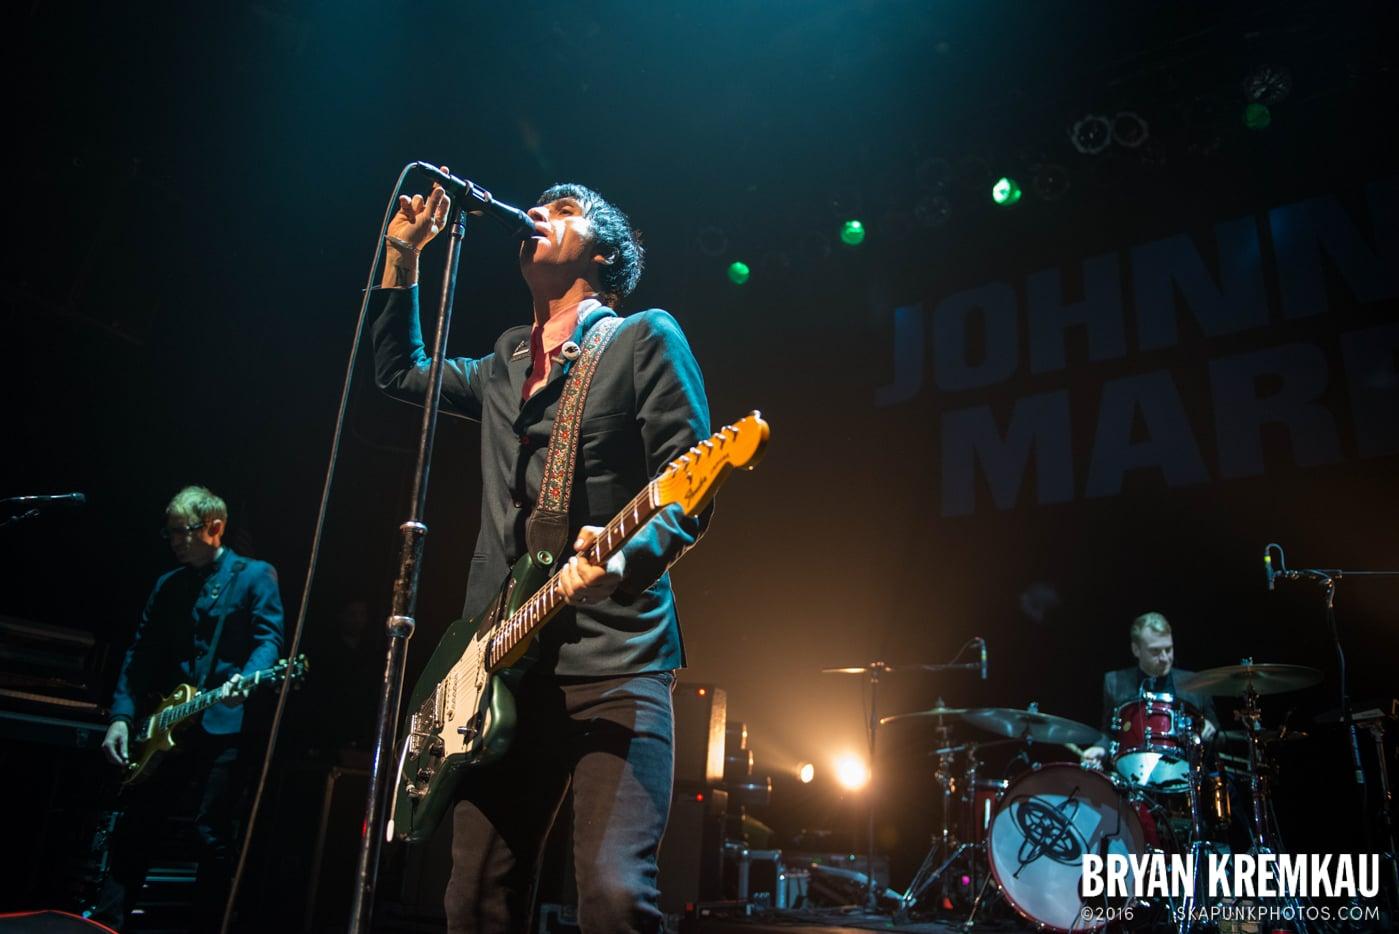 Johnny Marr @ Gramercy Theatre, NYC - 11.12.14 (51)